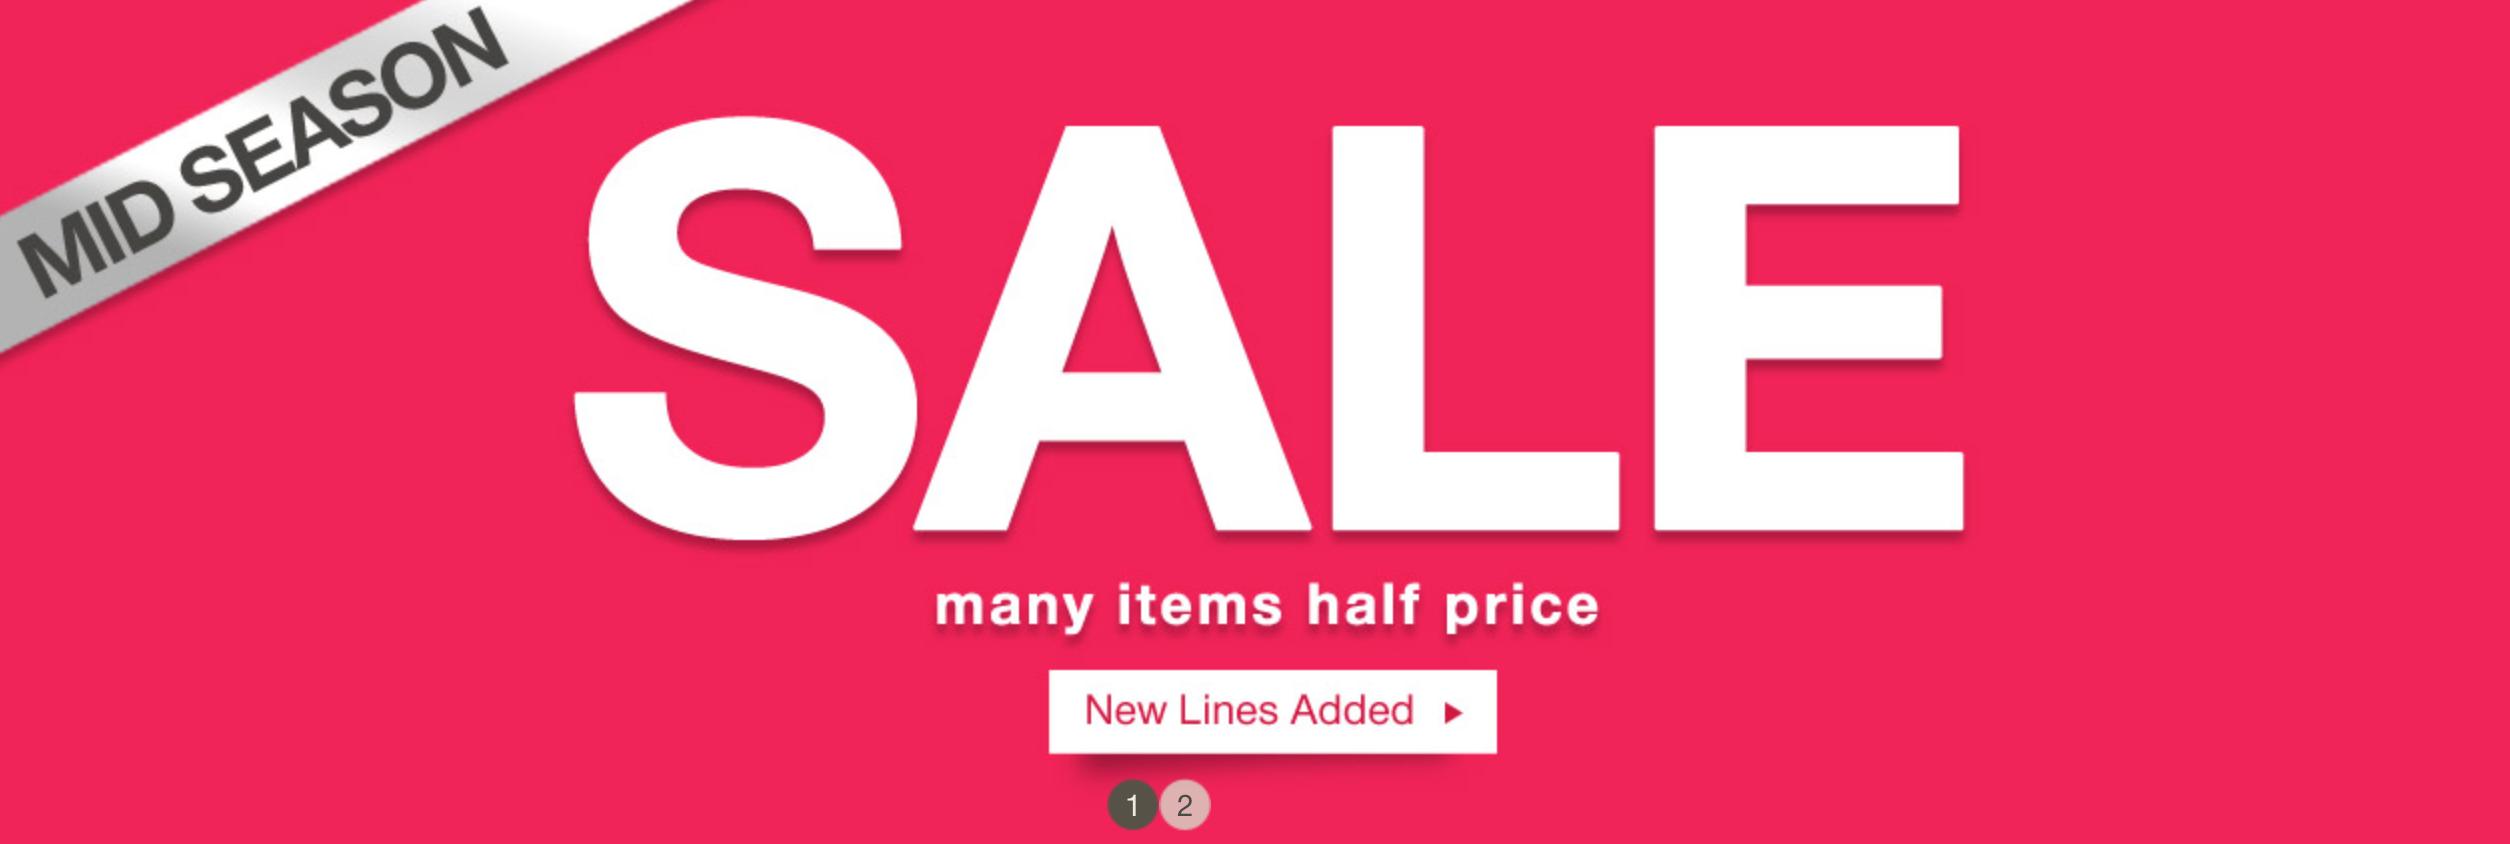 Damart: Mid Season Sale up to 60% off